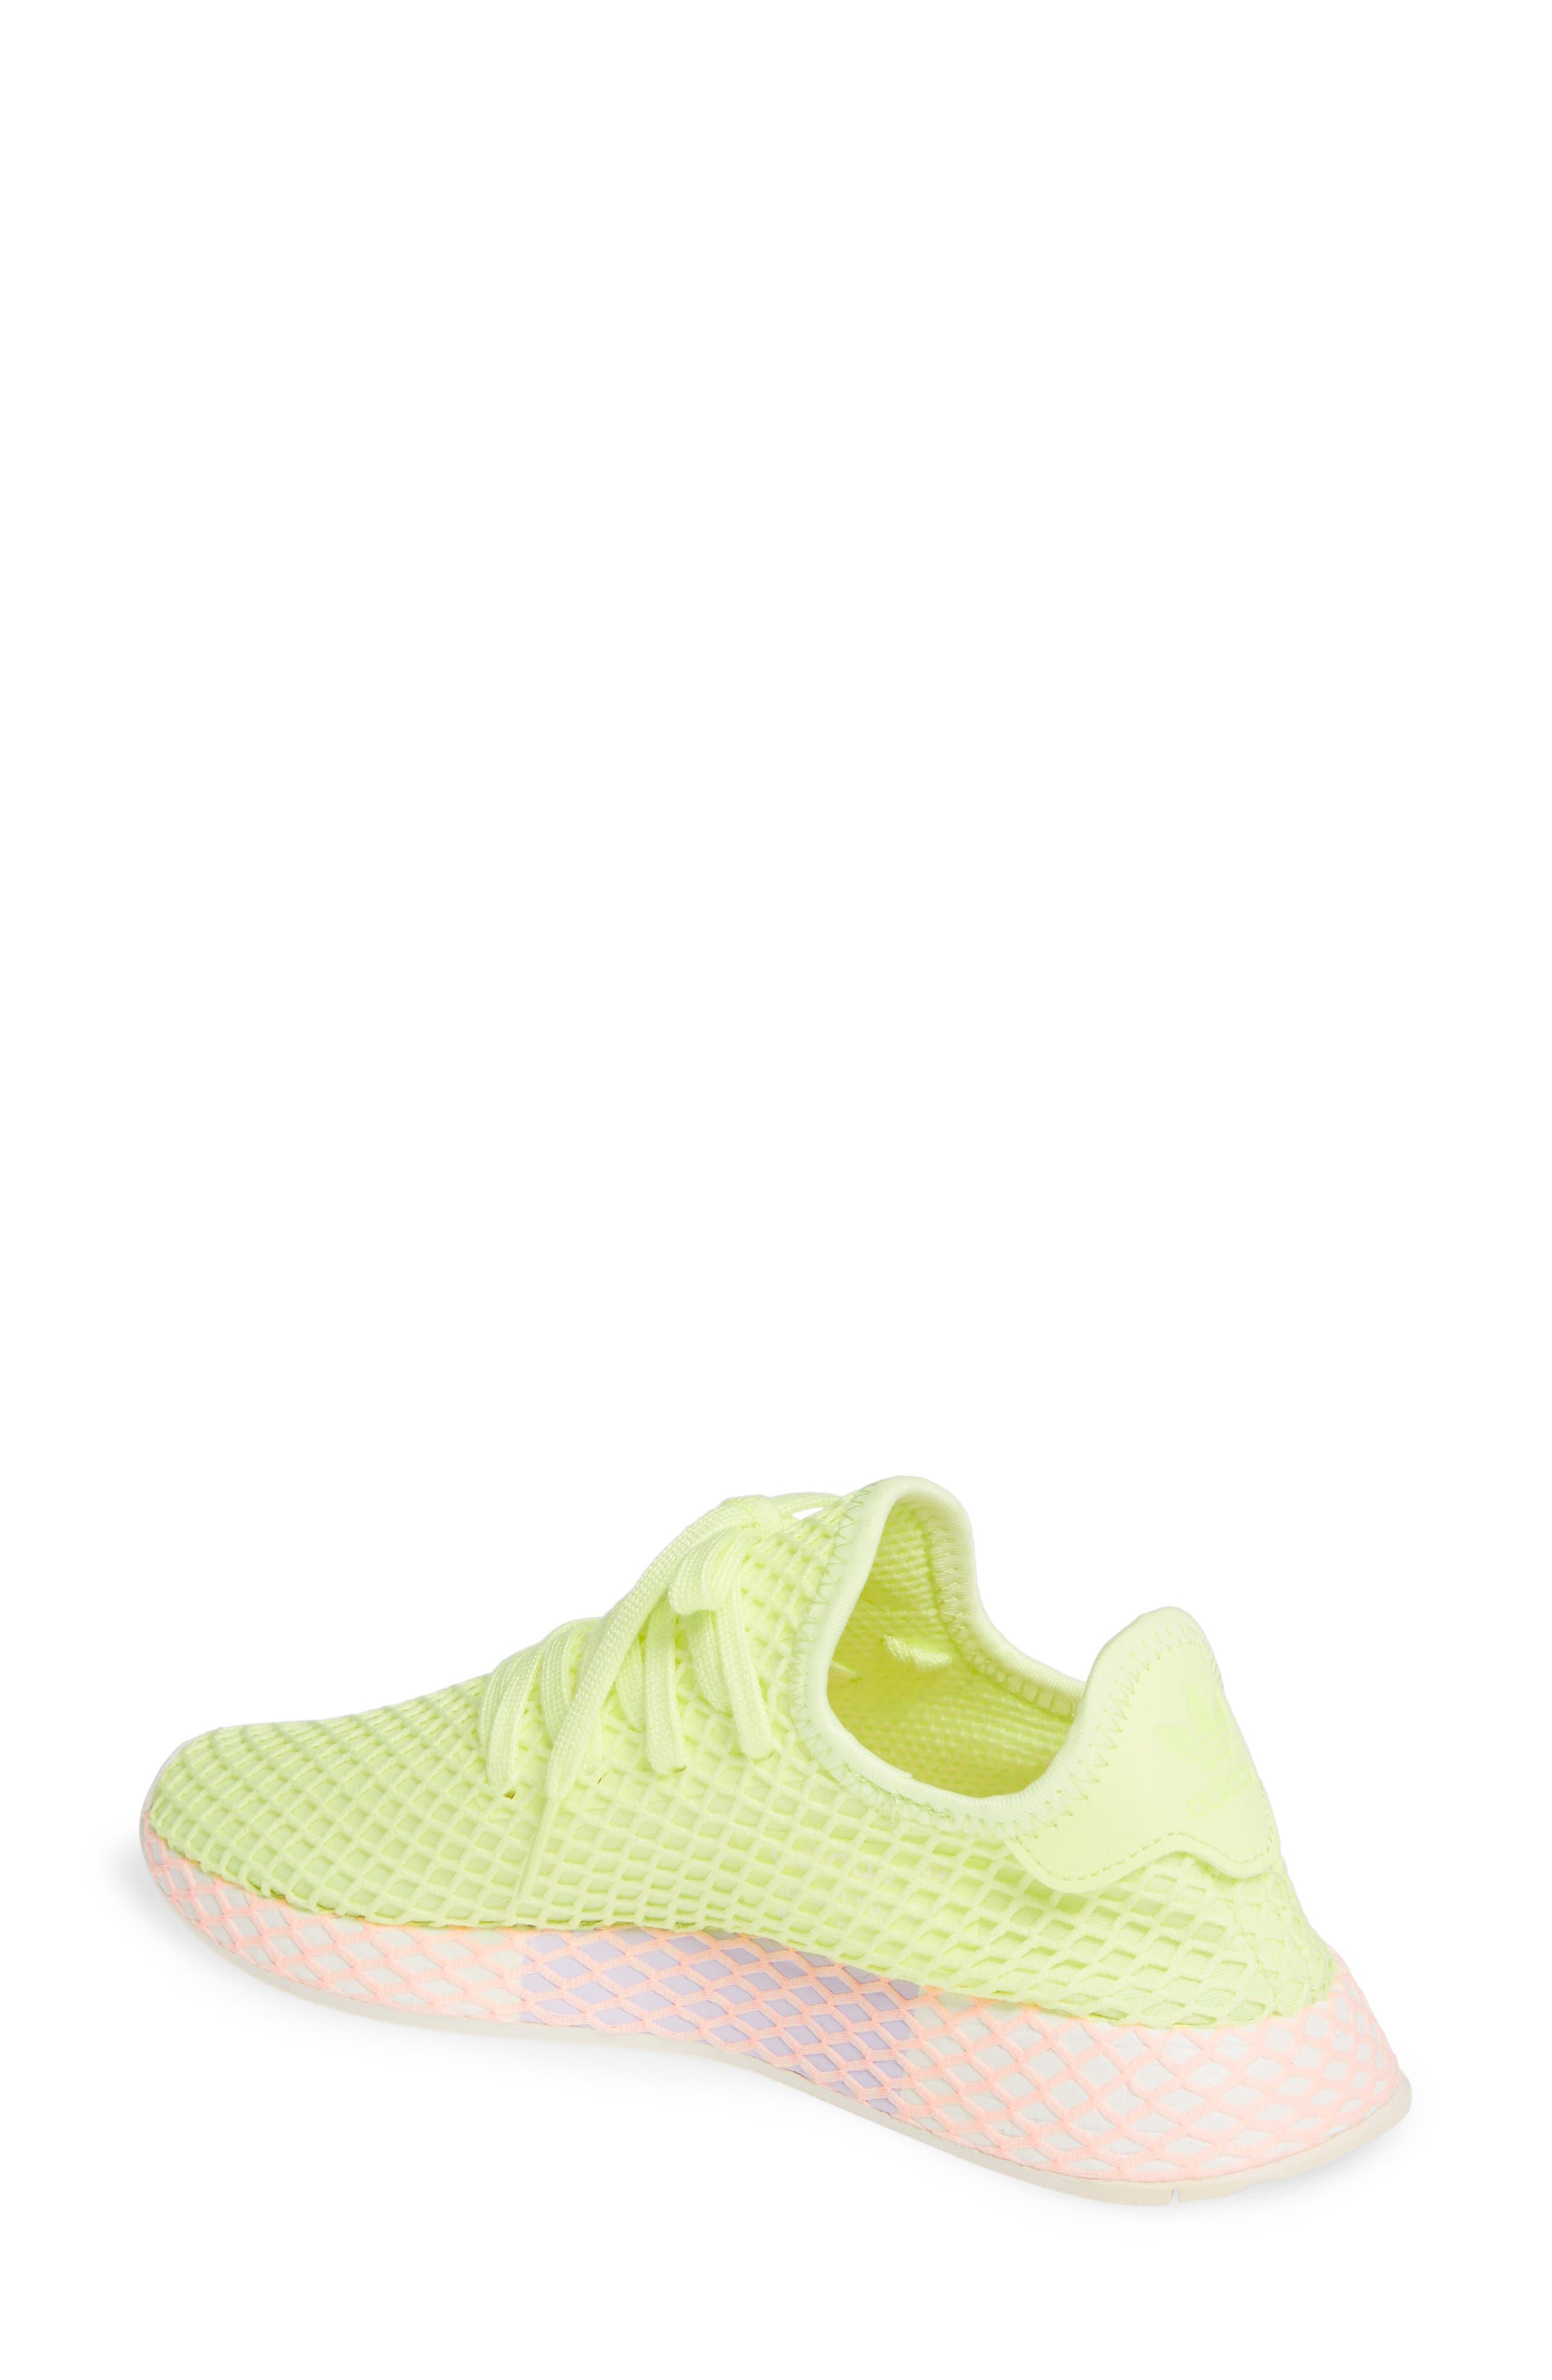 Deerupt Runner Sneaker,                             Alternate thumbnail 2, color,                             GLOW/ GLOW/ CLEAR LILAC